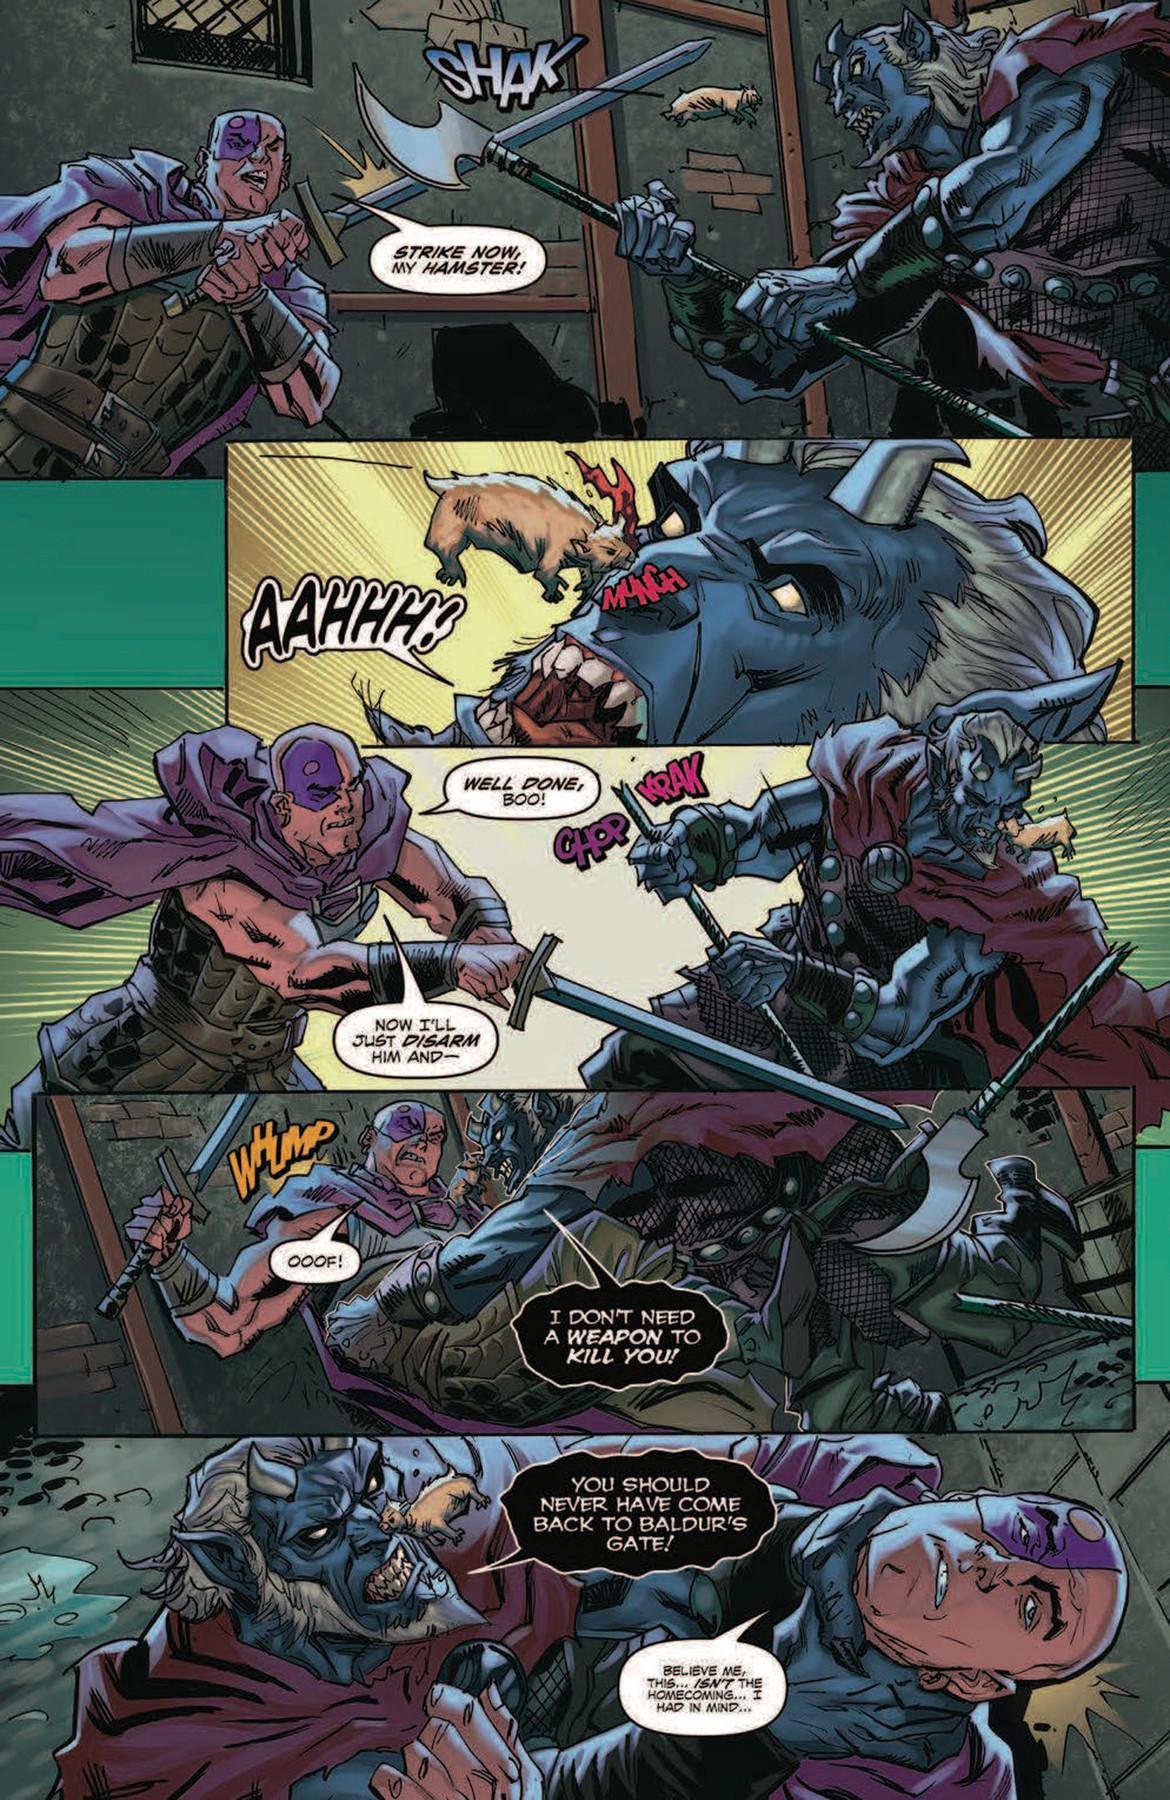 dungeons_and_dragons_evil_at_baldurs_gate_page_2.jpg